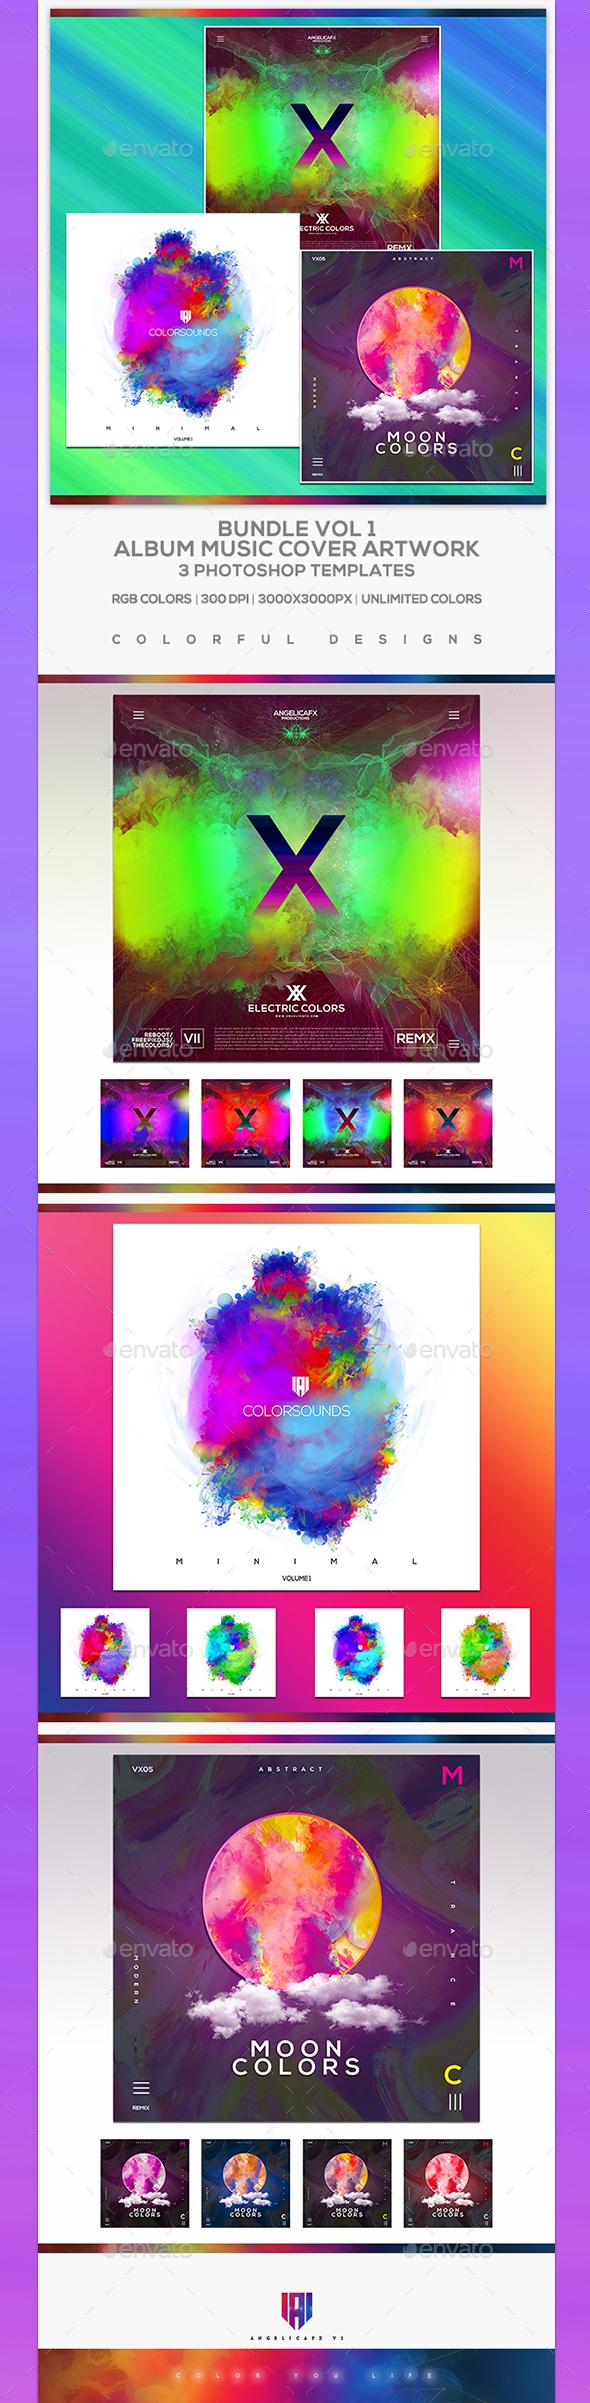 Electro - Music Album Cover Artwork Template Bundle 1